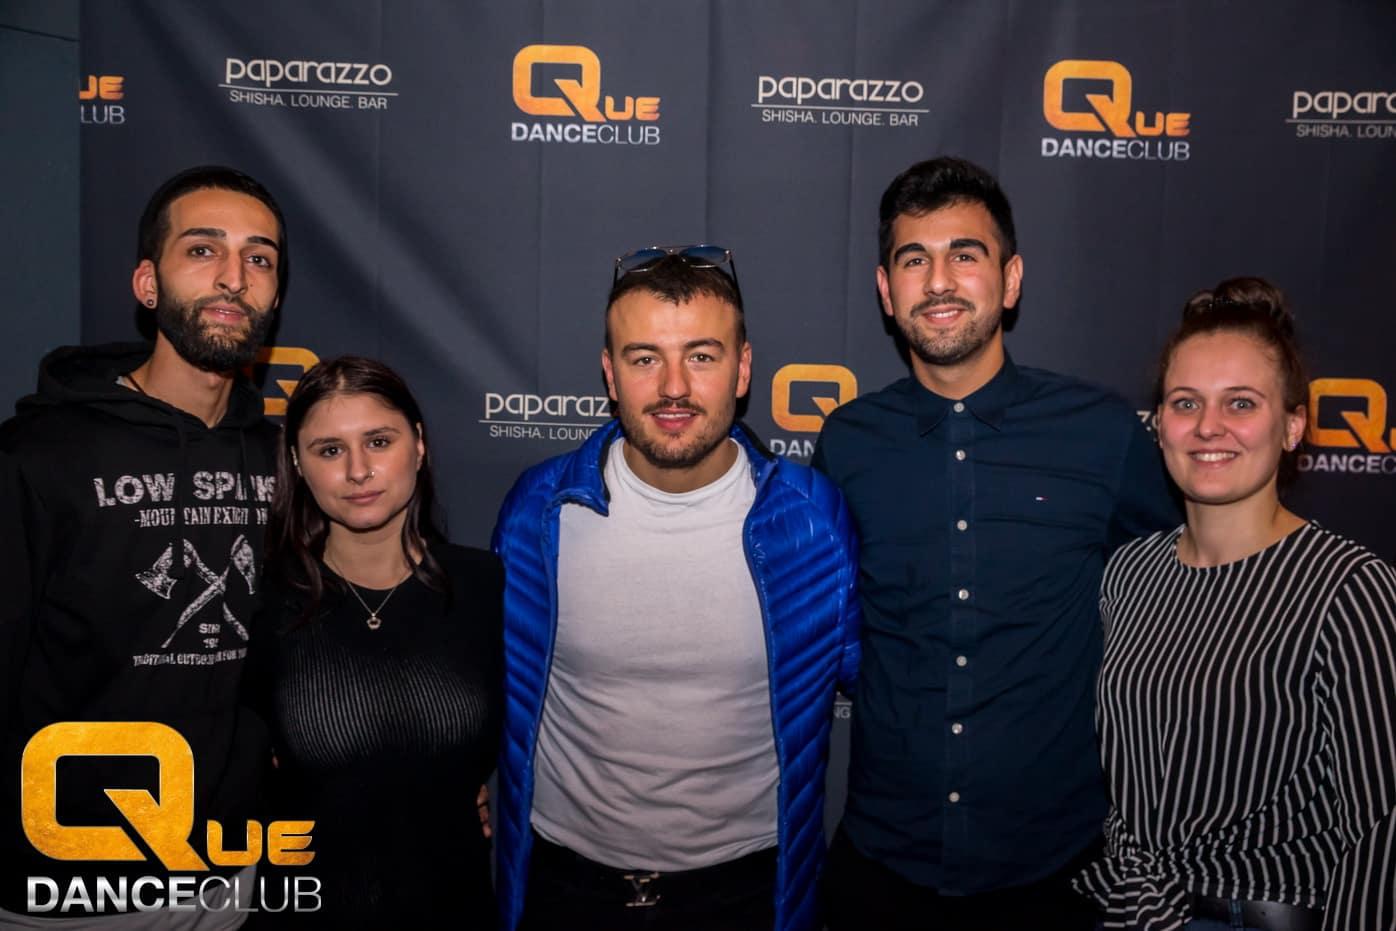 2018_12_08_Que_Danceclub_Paparazzo_Night_Ardian_Bujupi_Live_Nightlife_Scene_Timo_088